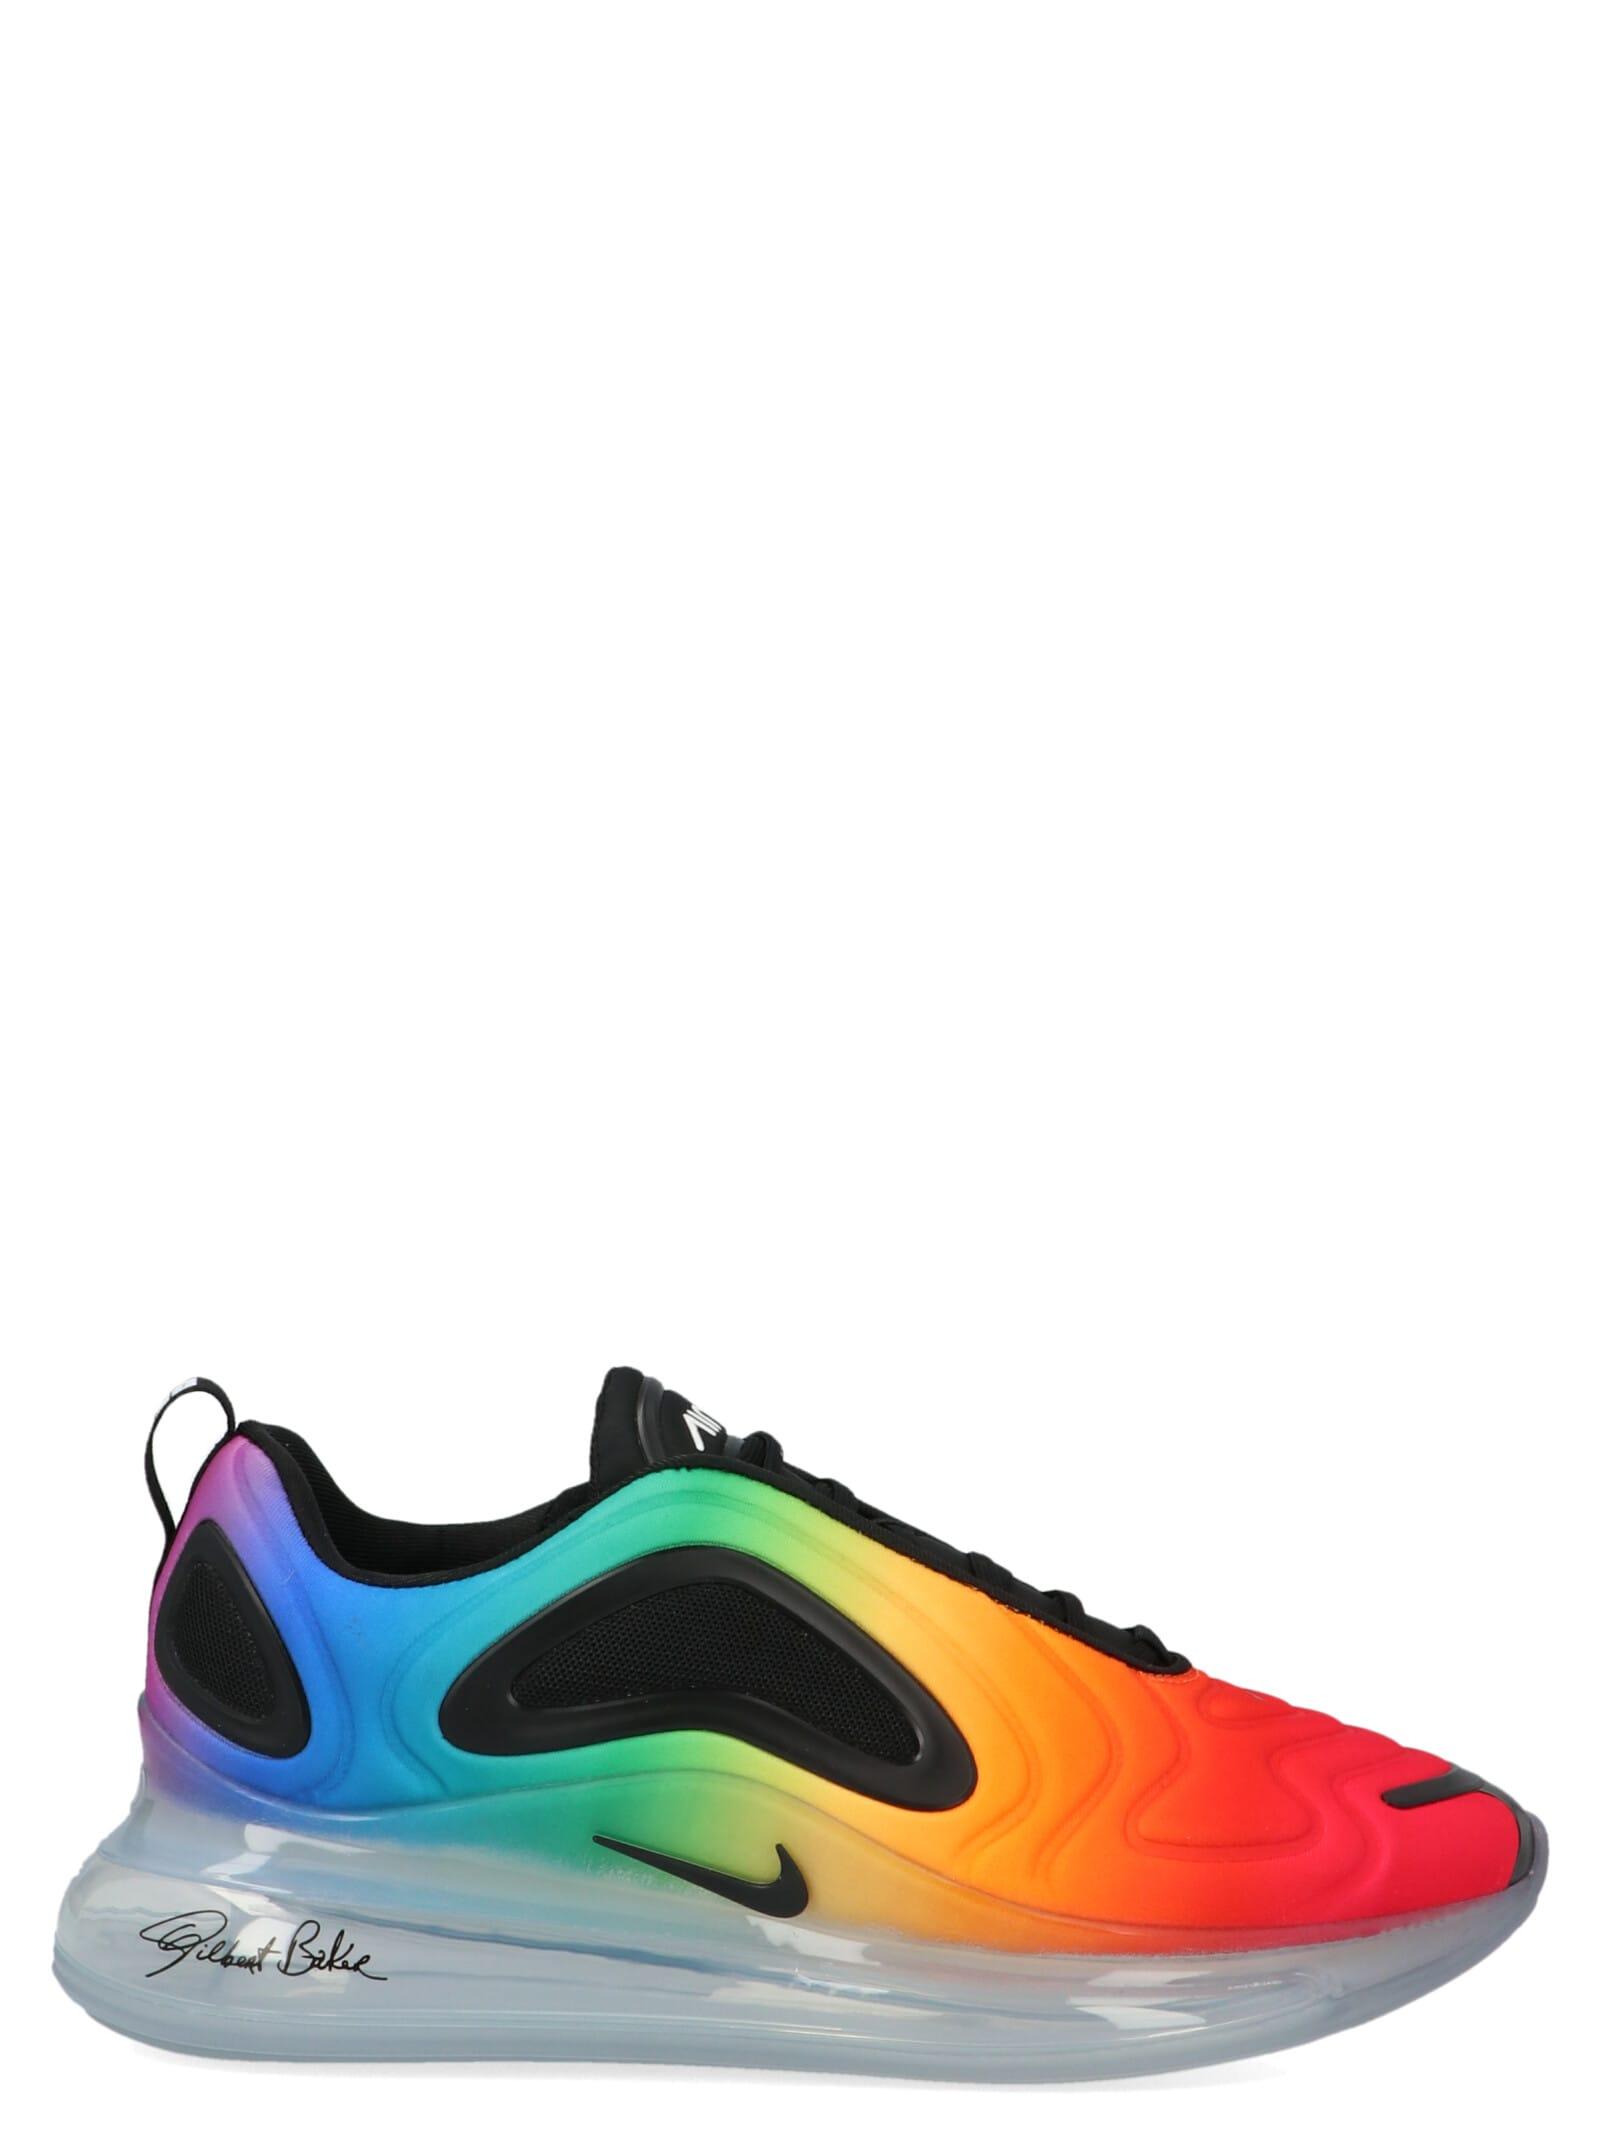 Nike 'air Max 720 Betrue' Shoes